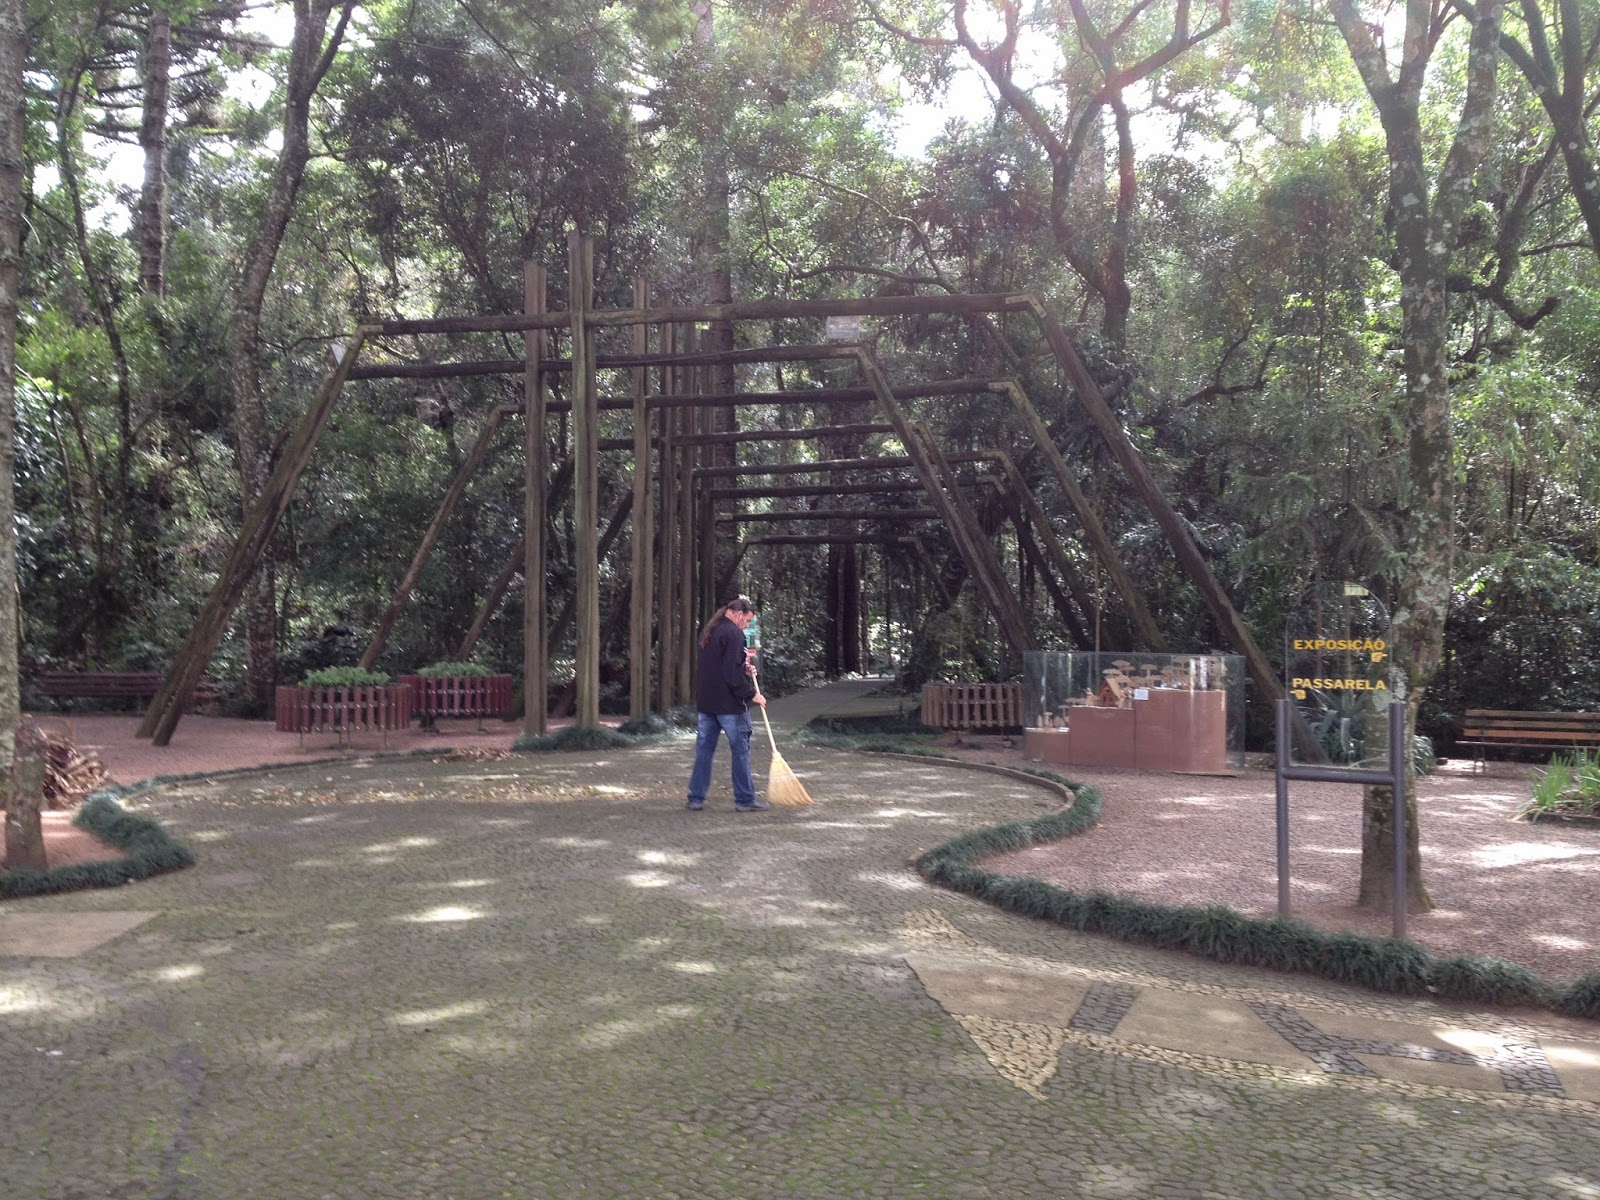 Museu de História Natural - Curitiba